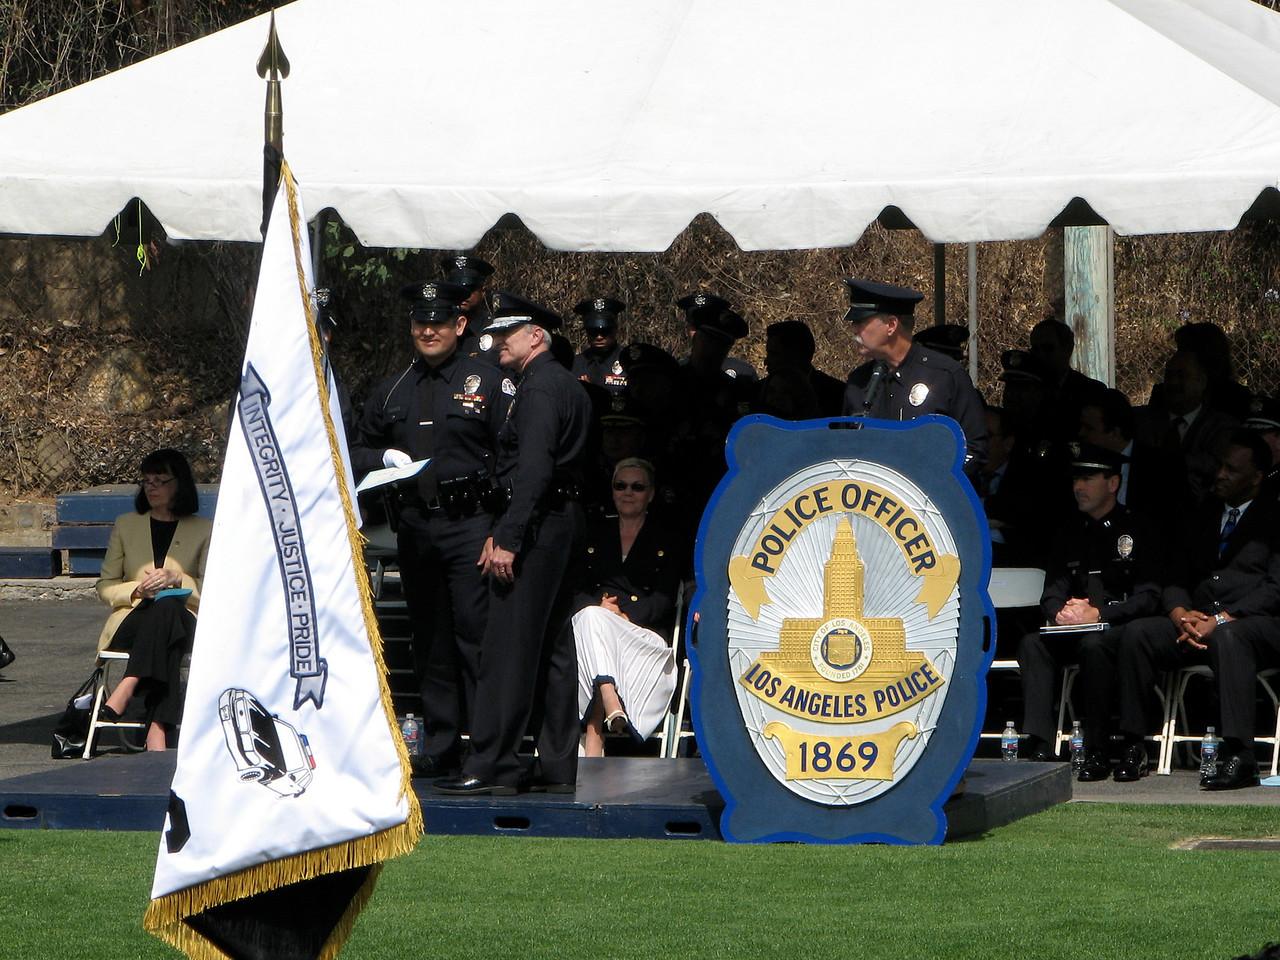 2007 05 25 Fri - LAPD flag & shield